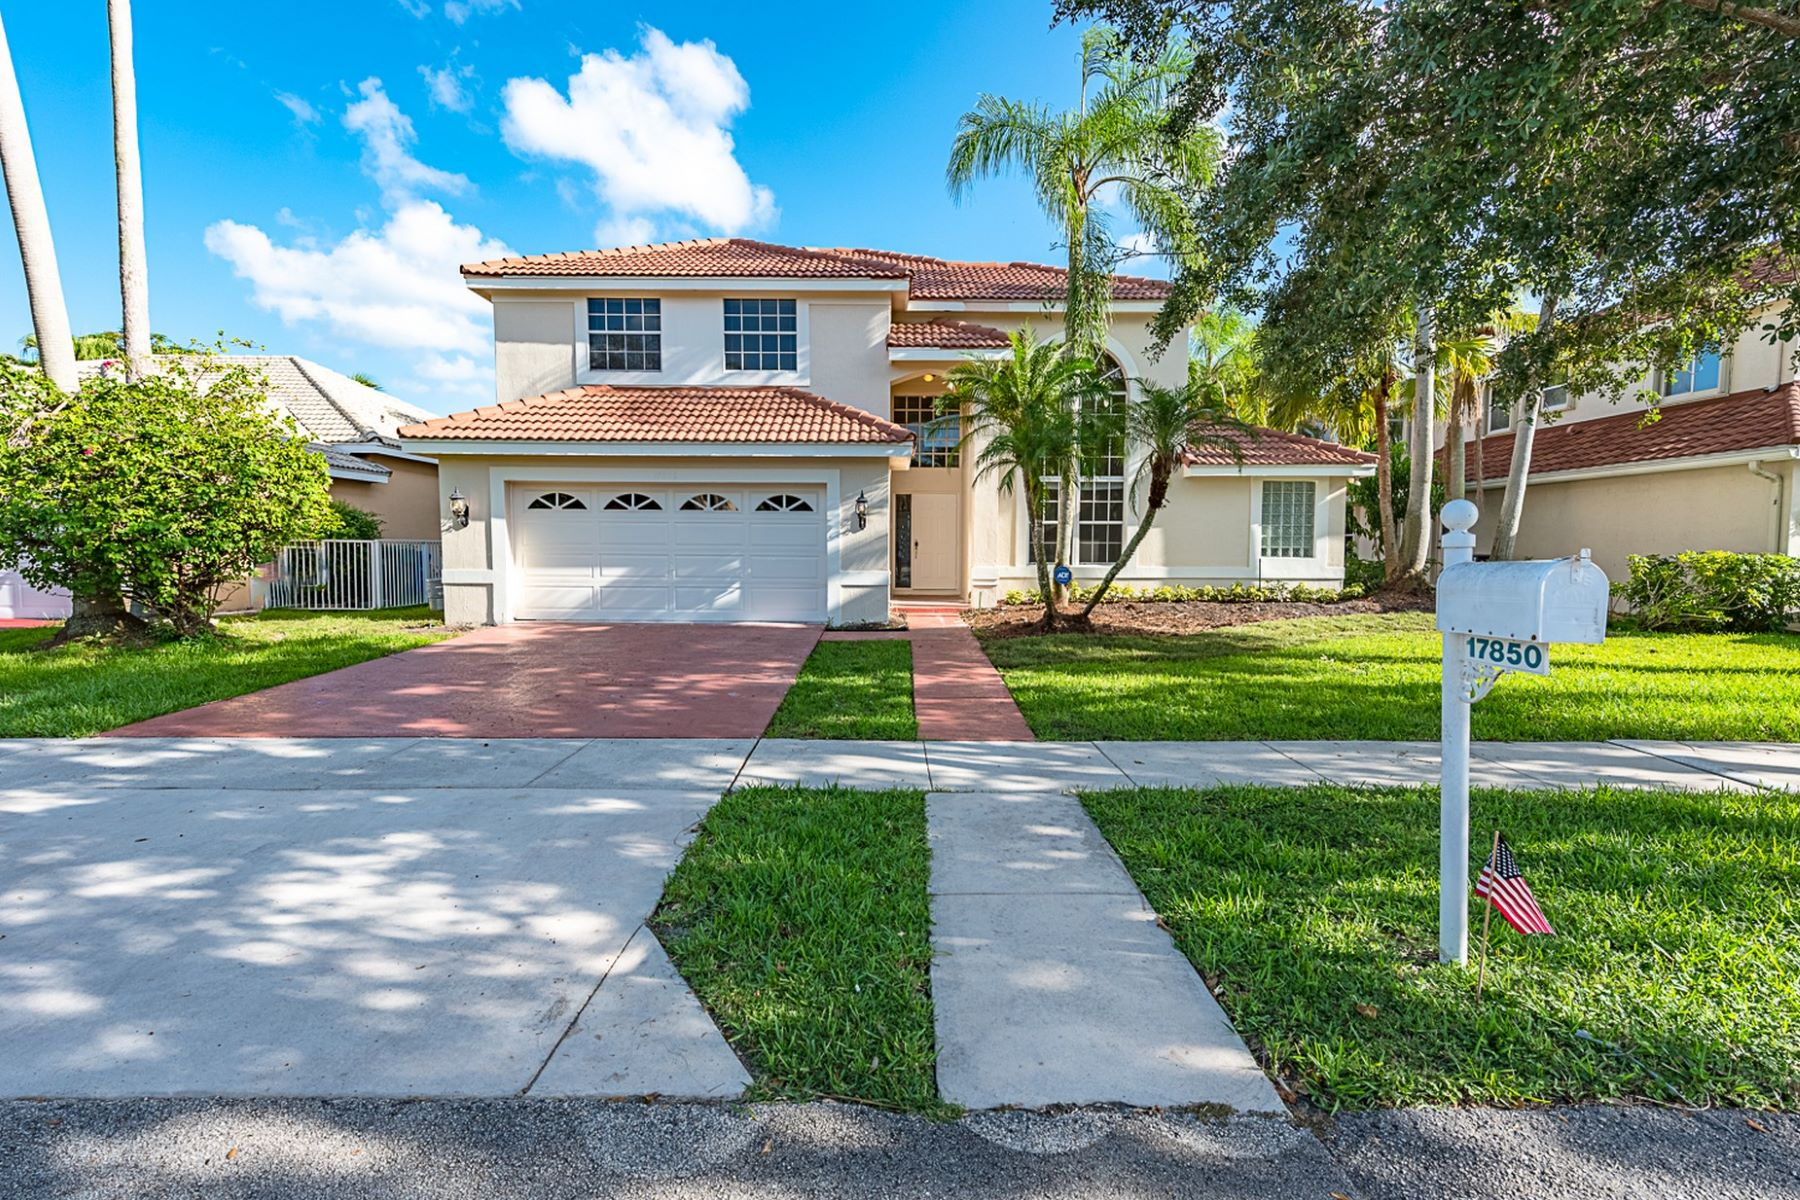 واحد منزل الأسرة للـ Rent في 17850 Nw 15th Ct 17850 Nw 15th Ct 17850, Pembroke Pines, Florida, 33029 United States